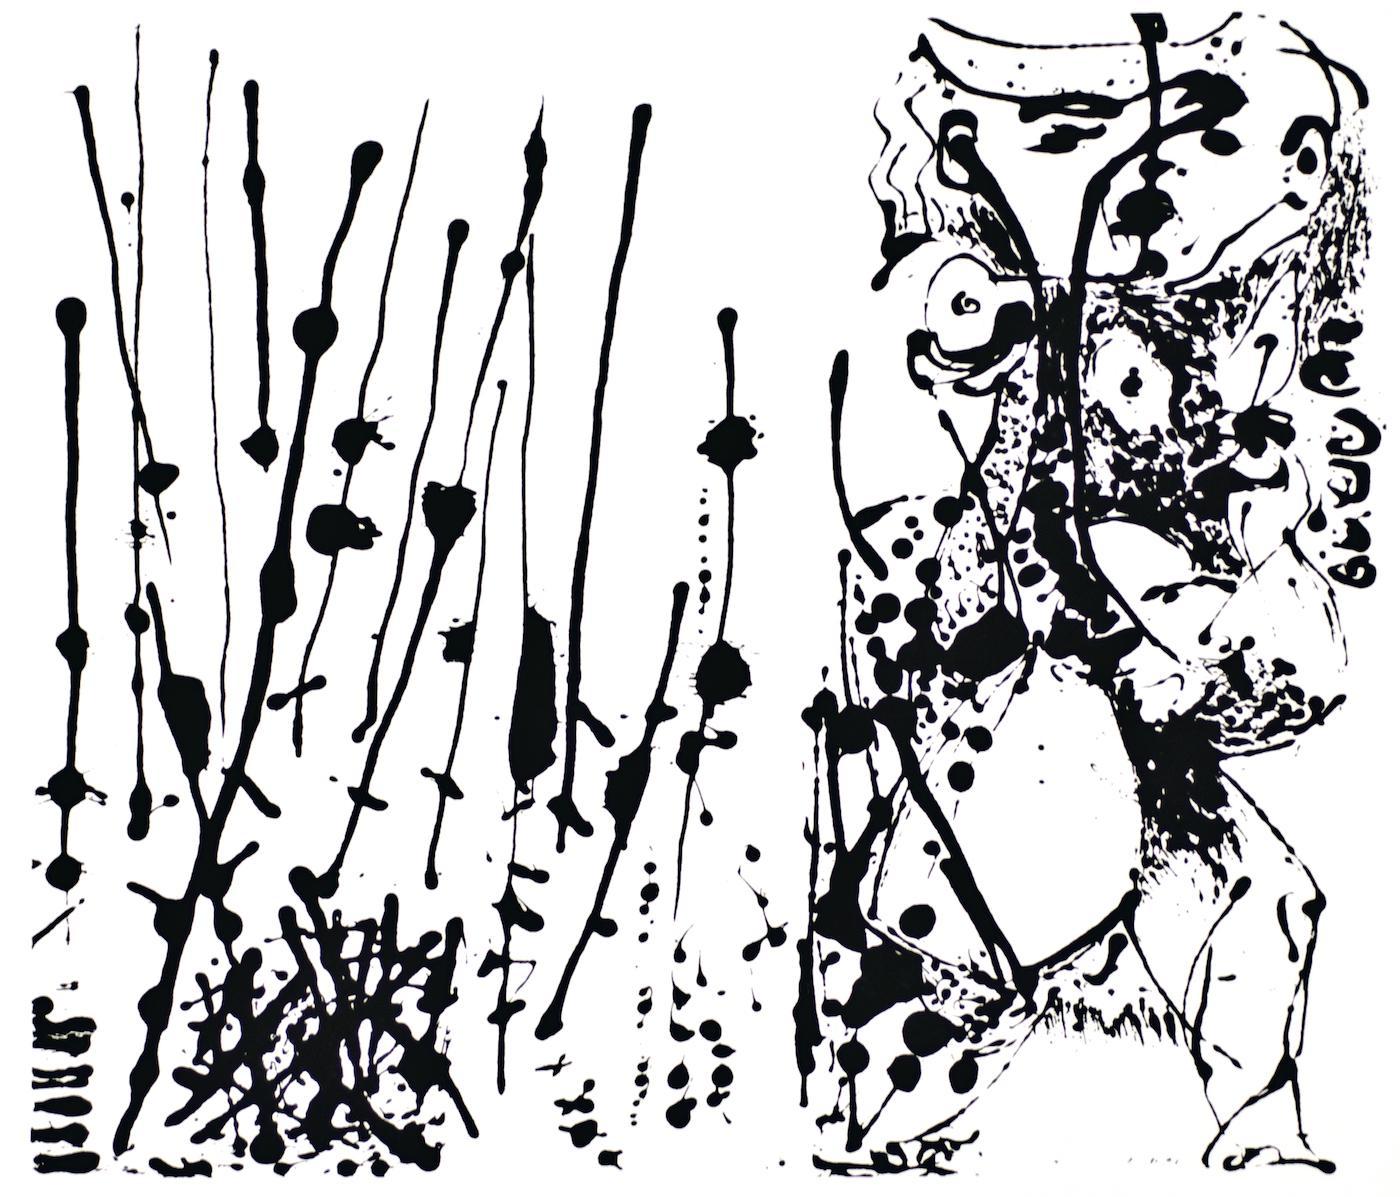 Untitled - Expression no. 1 - Original Serigraph After Jackson Pollock - 1964